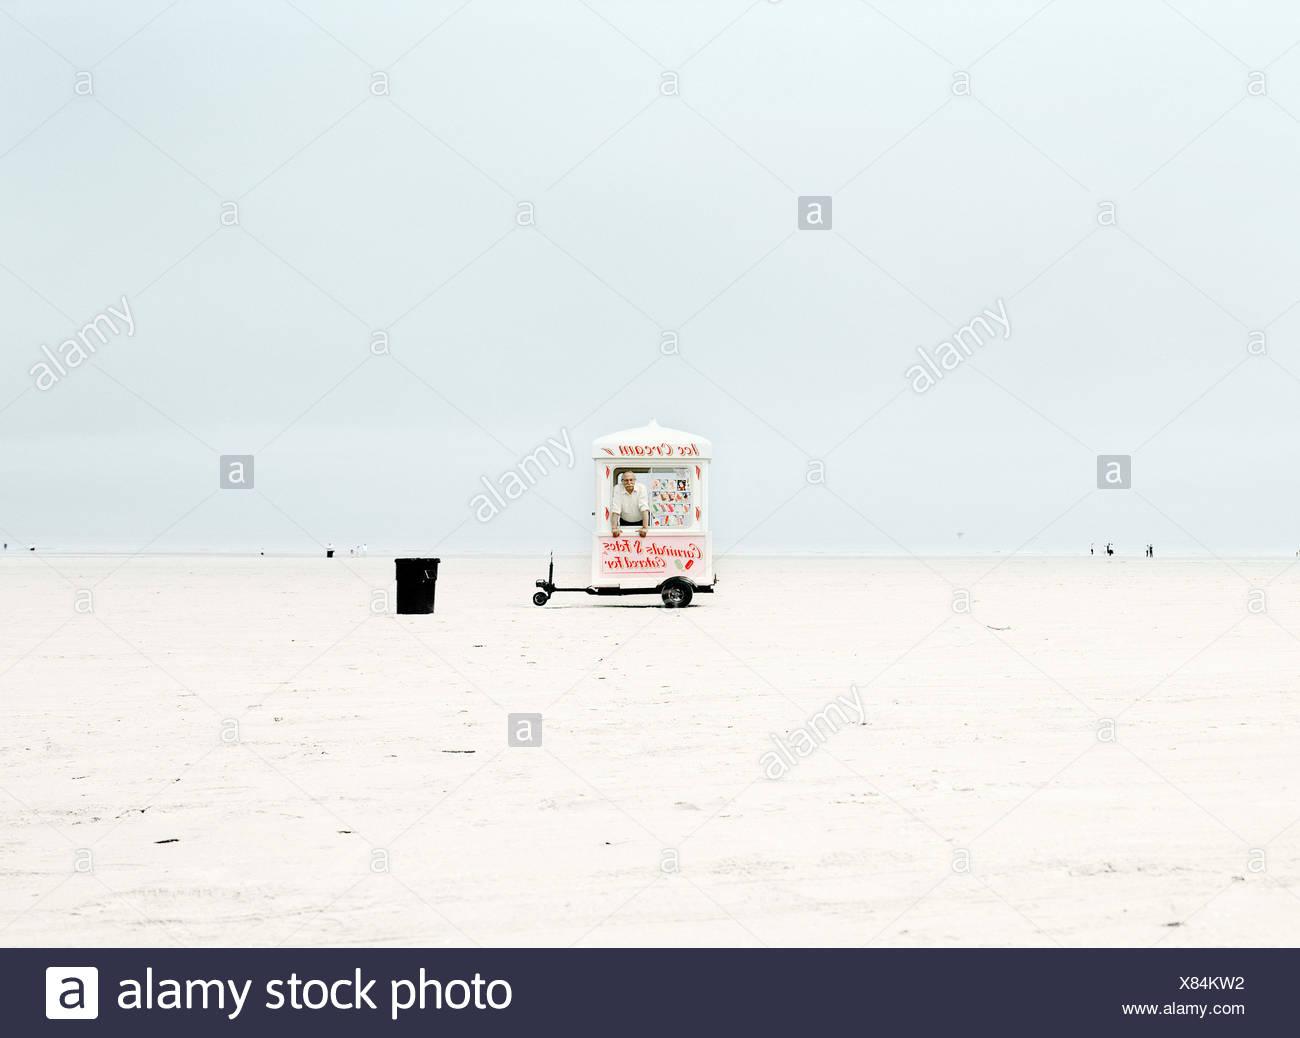 Man standing inside ice cream van on remote beach - Stock Image